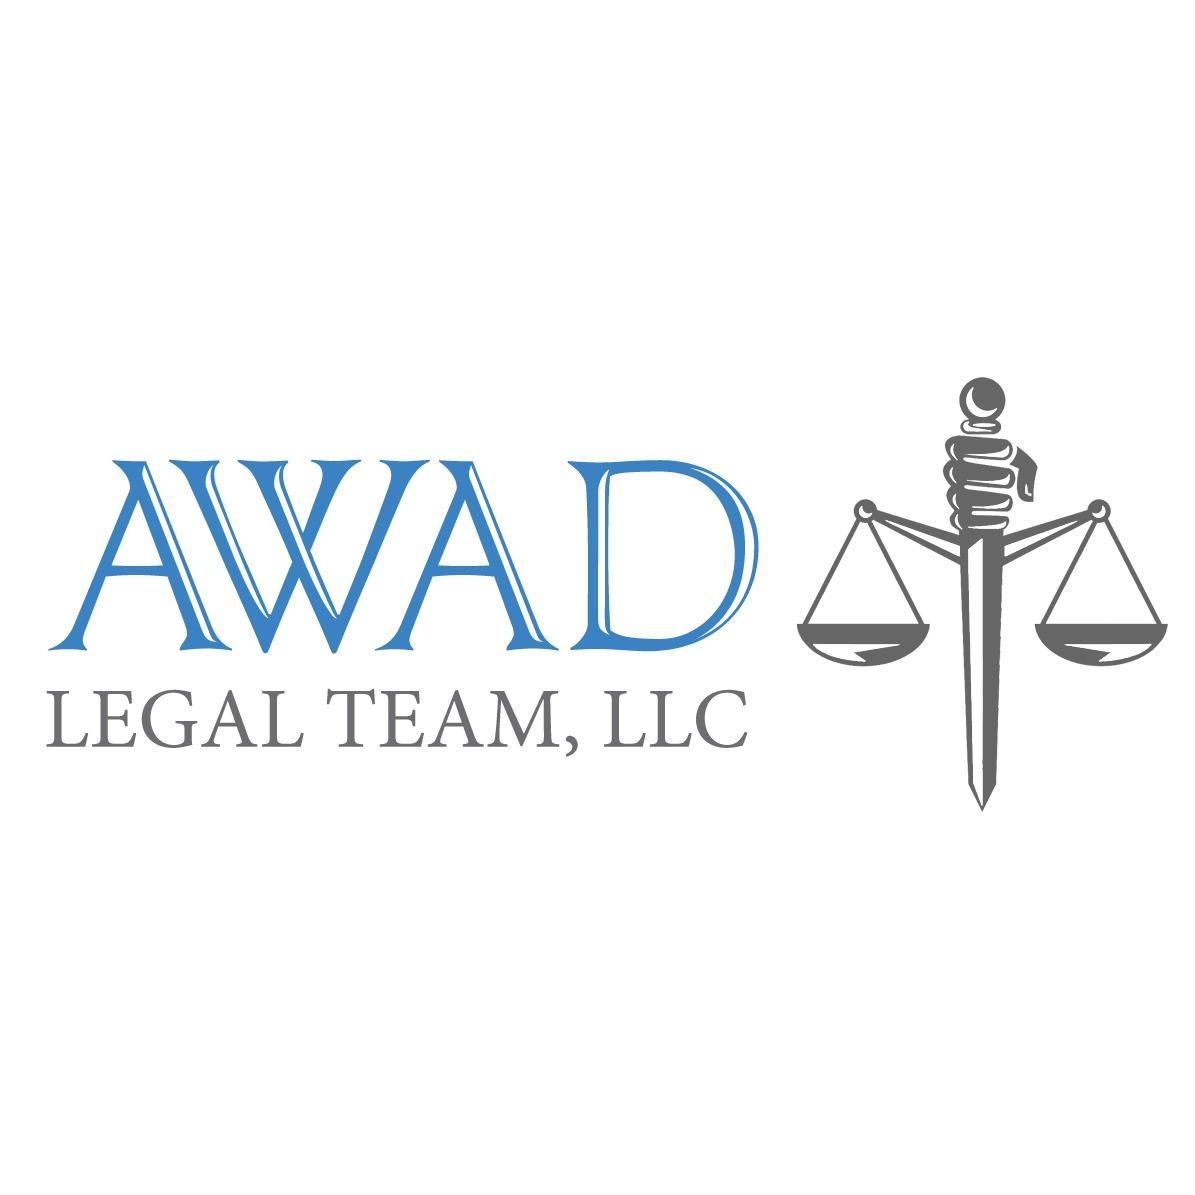 Awad Legal Team, LLC